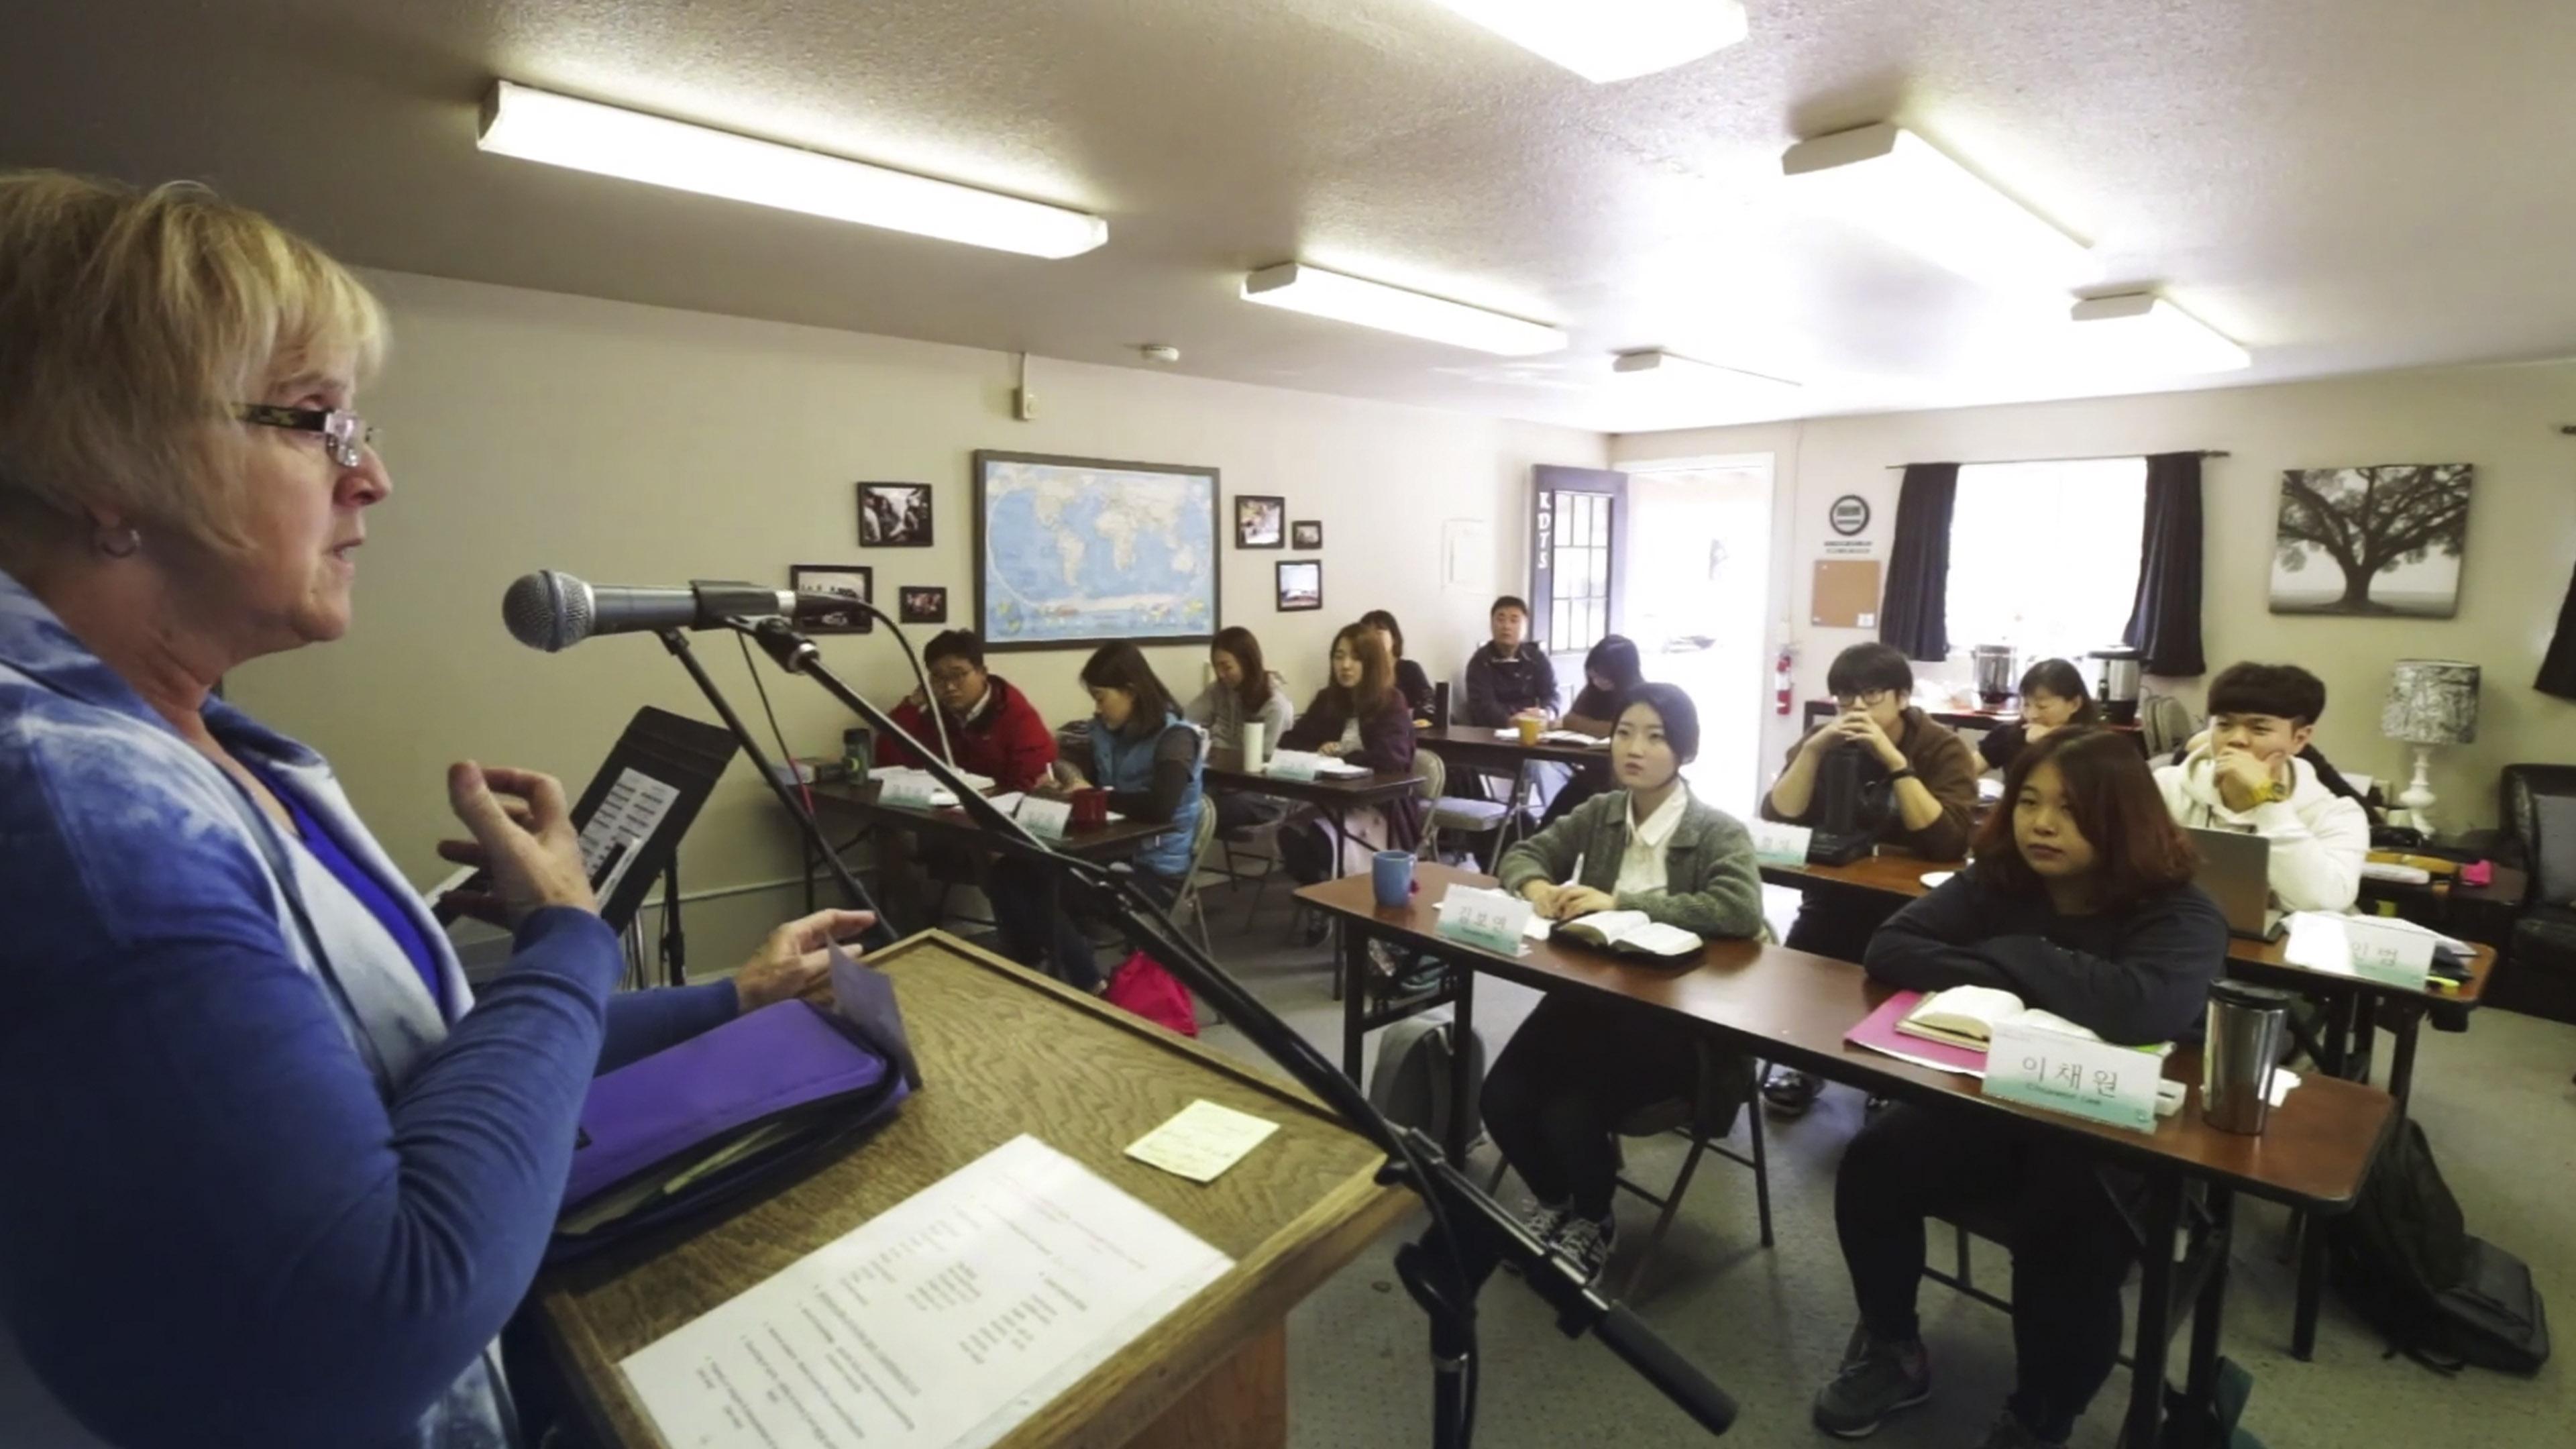 ywam salem classroom